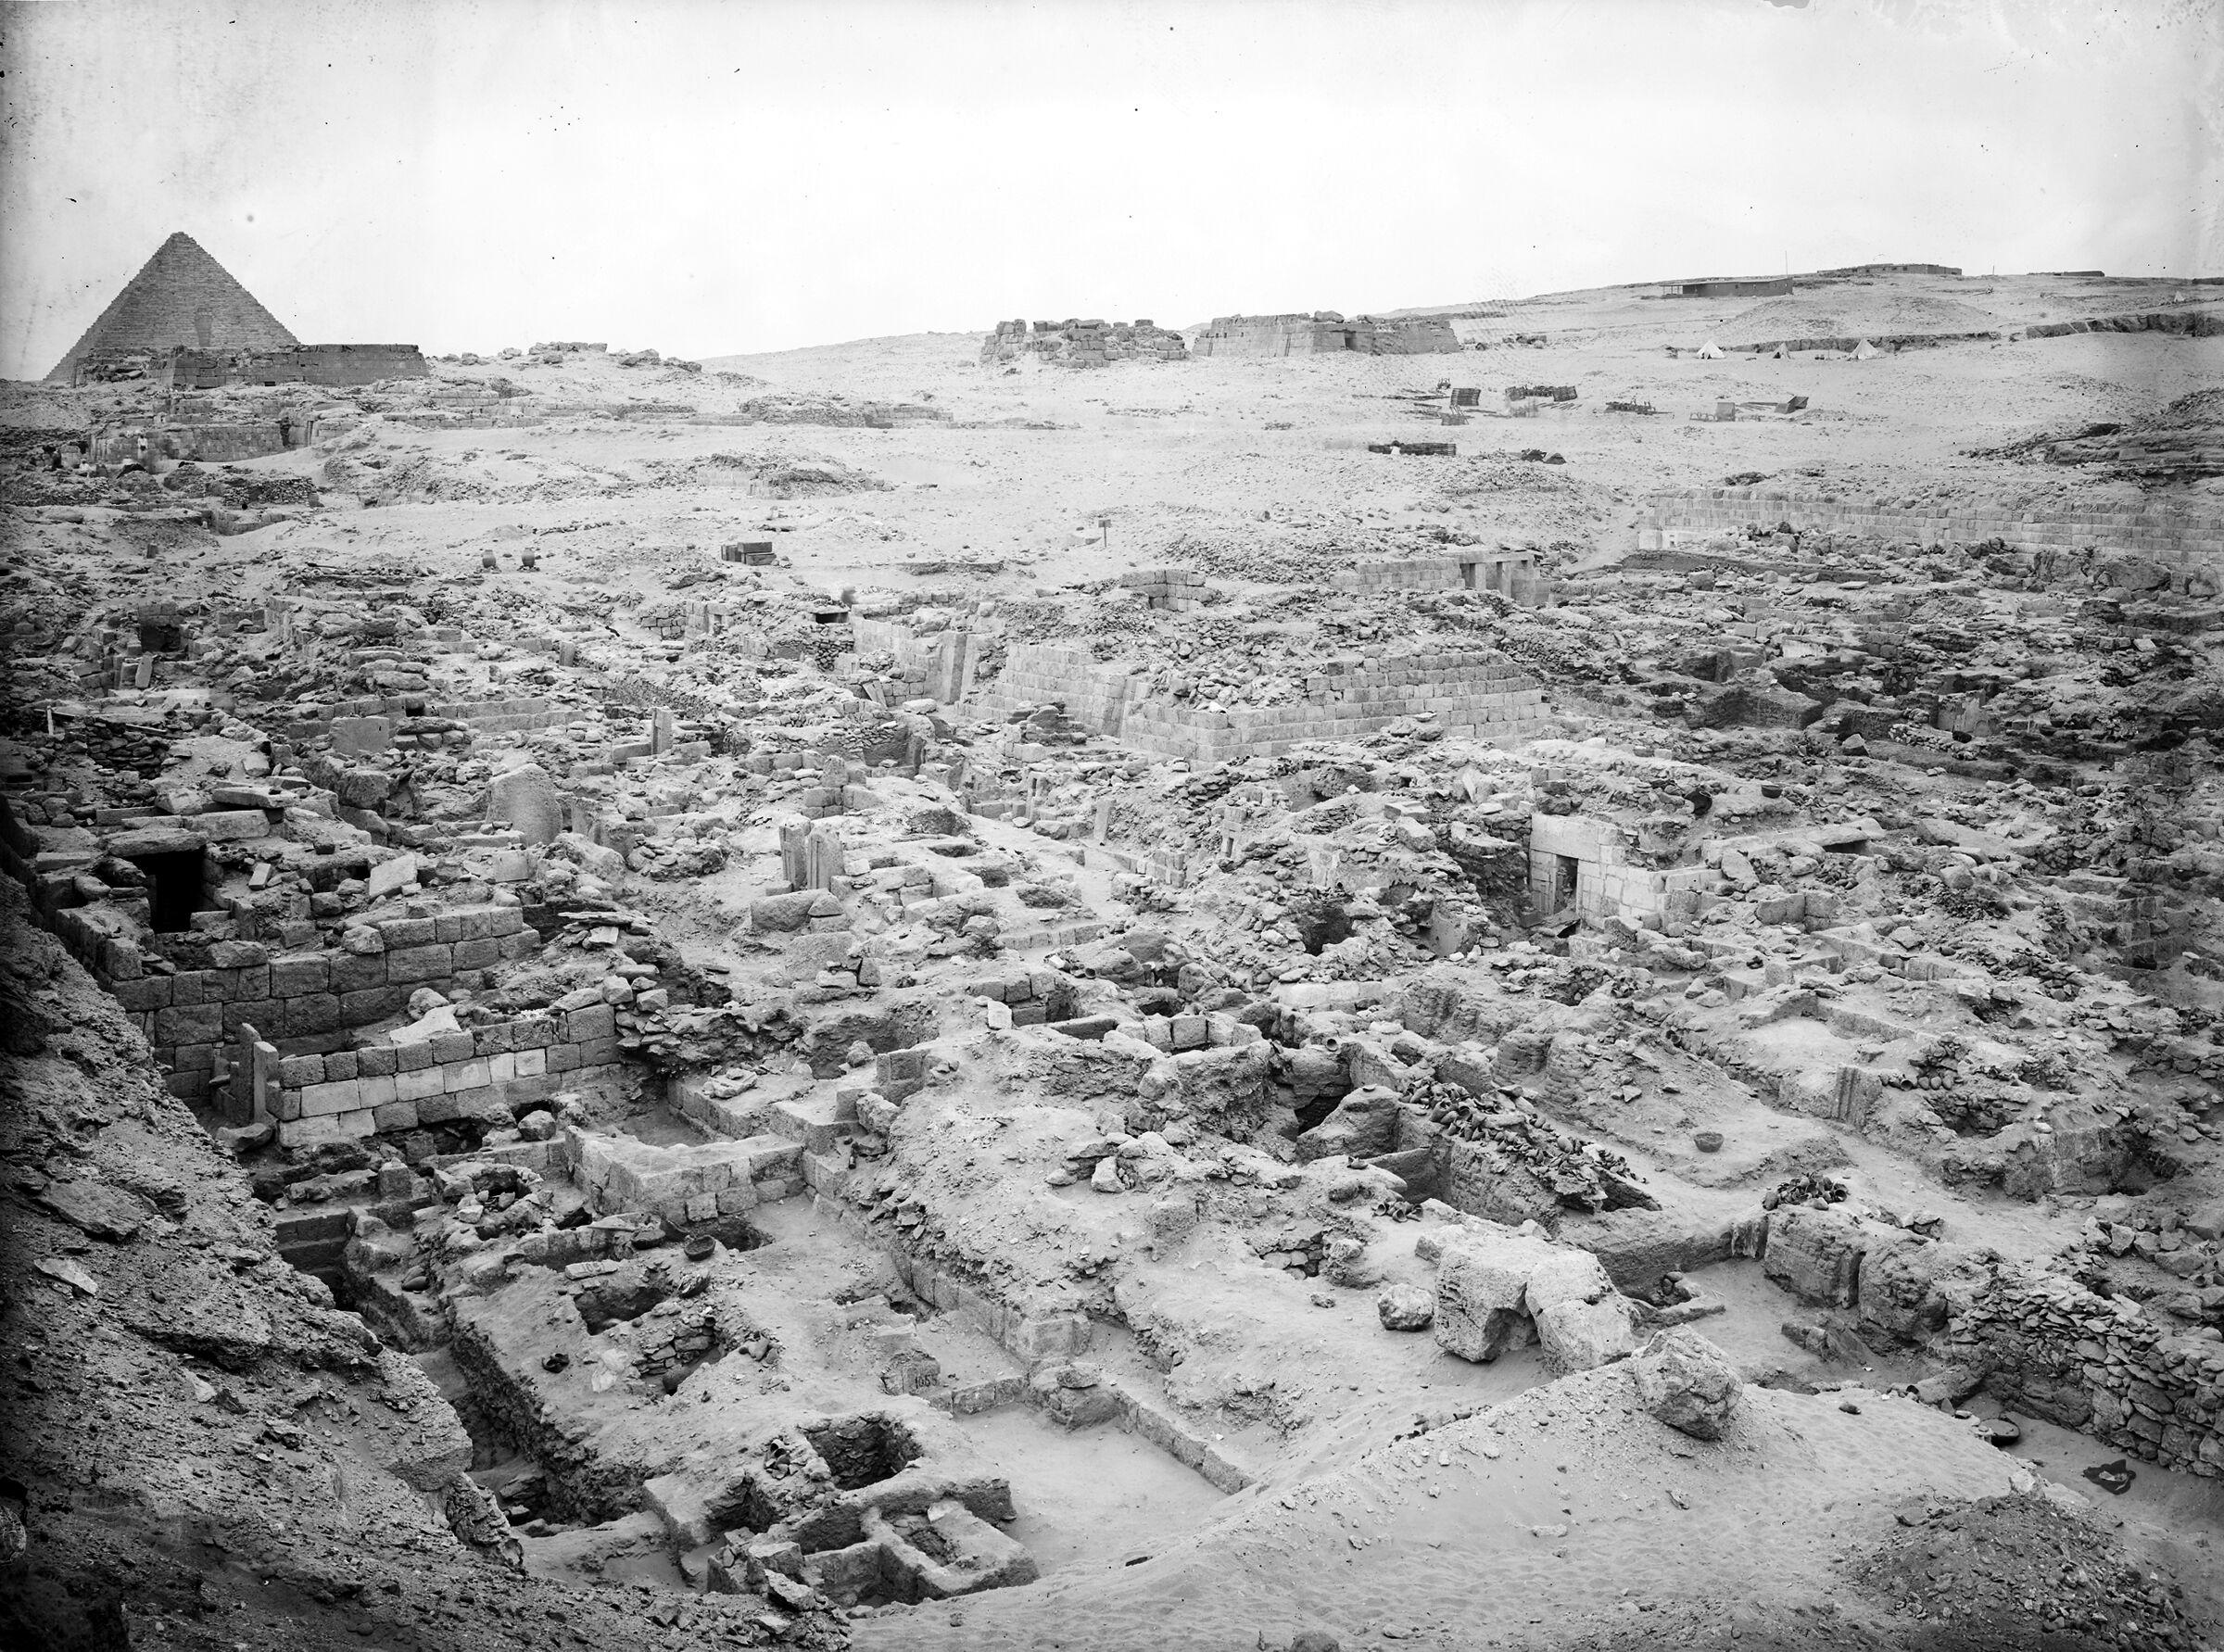 Western Cemetery: Site: Giza; View: G 1057, G 1052, G 1051, G 1058, G 1055